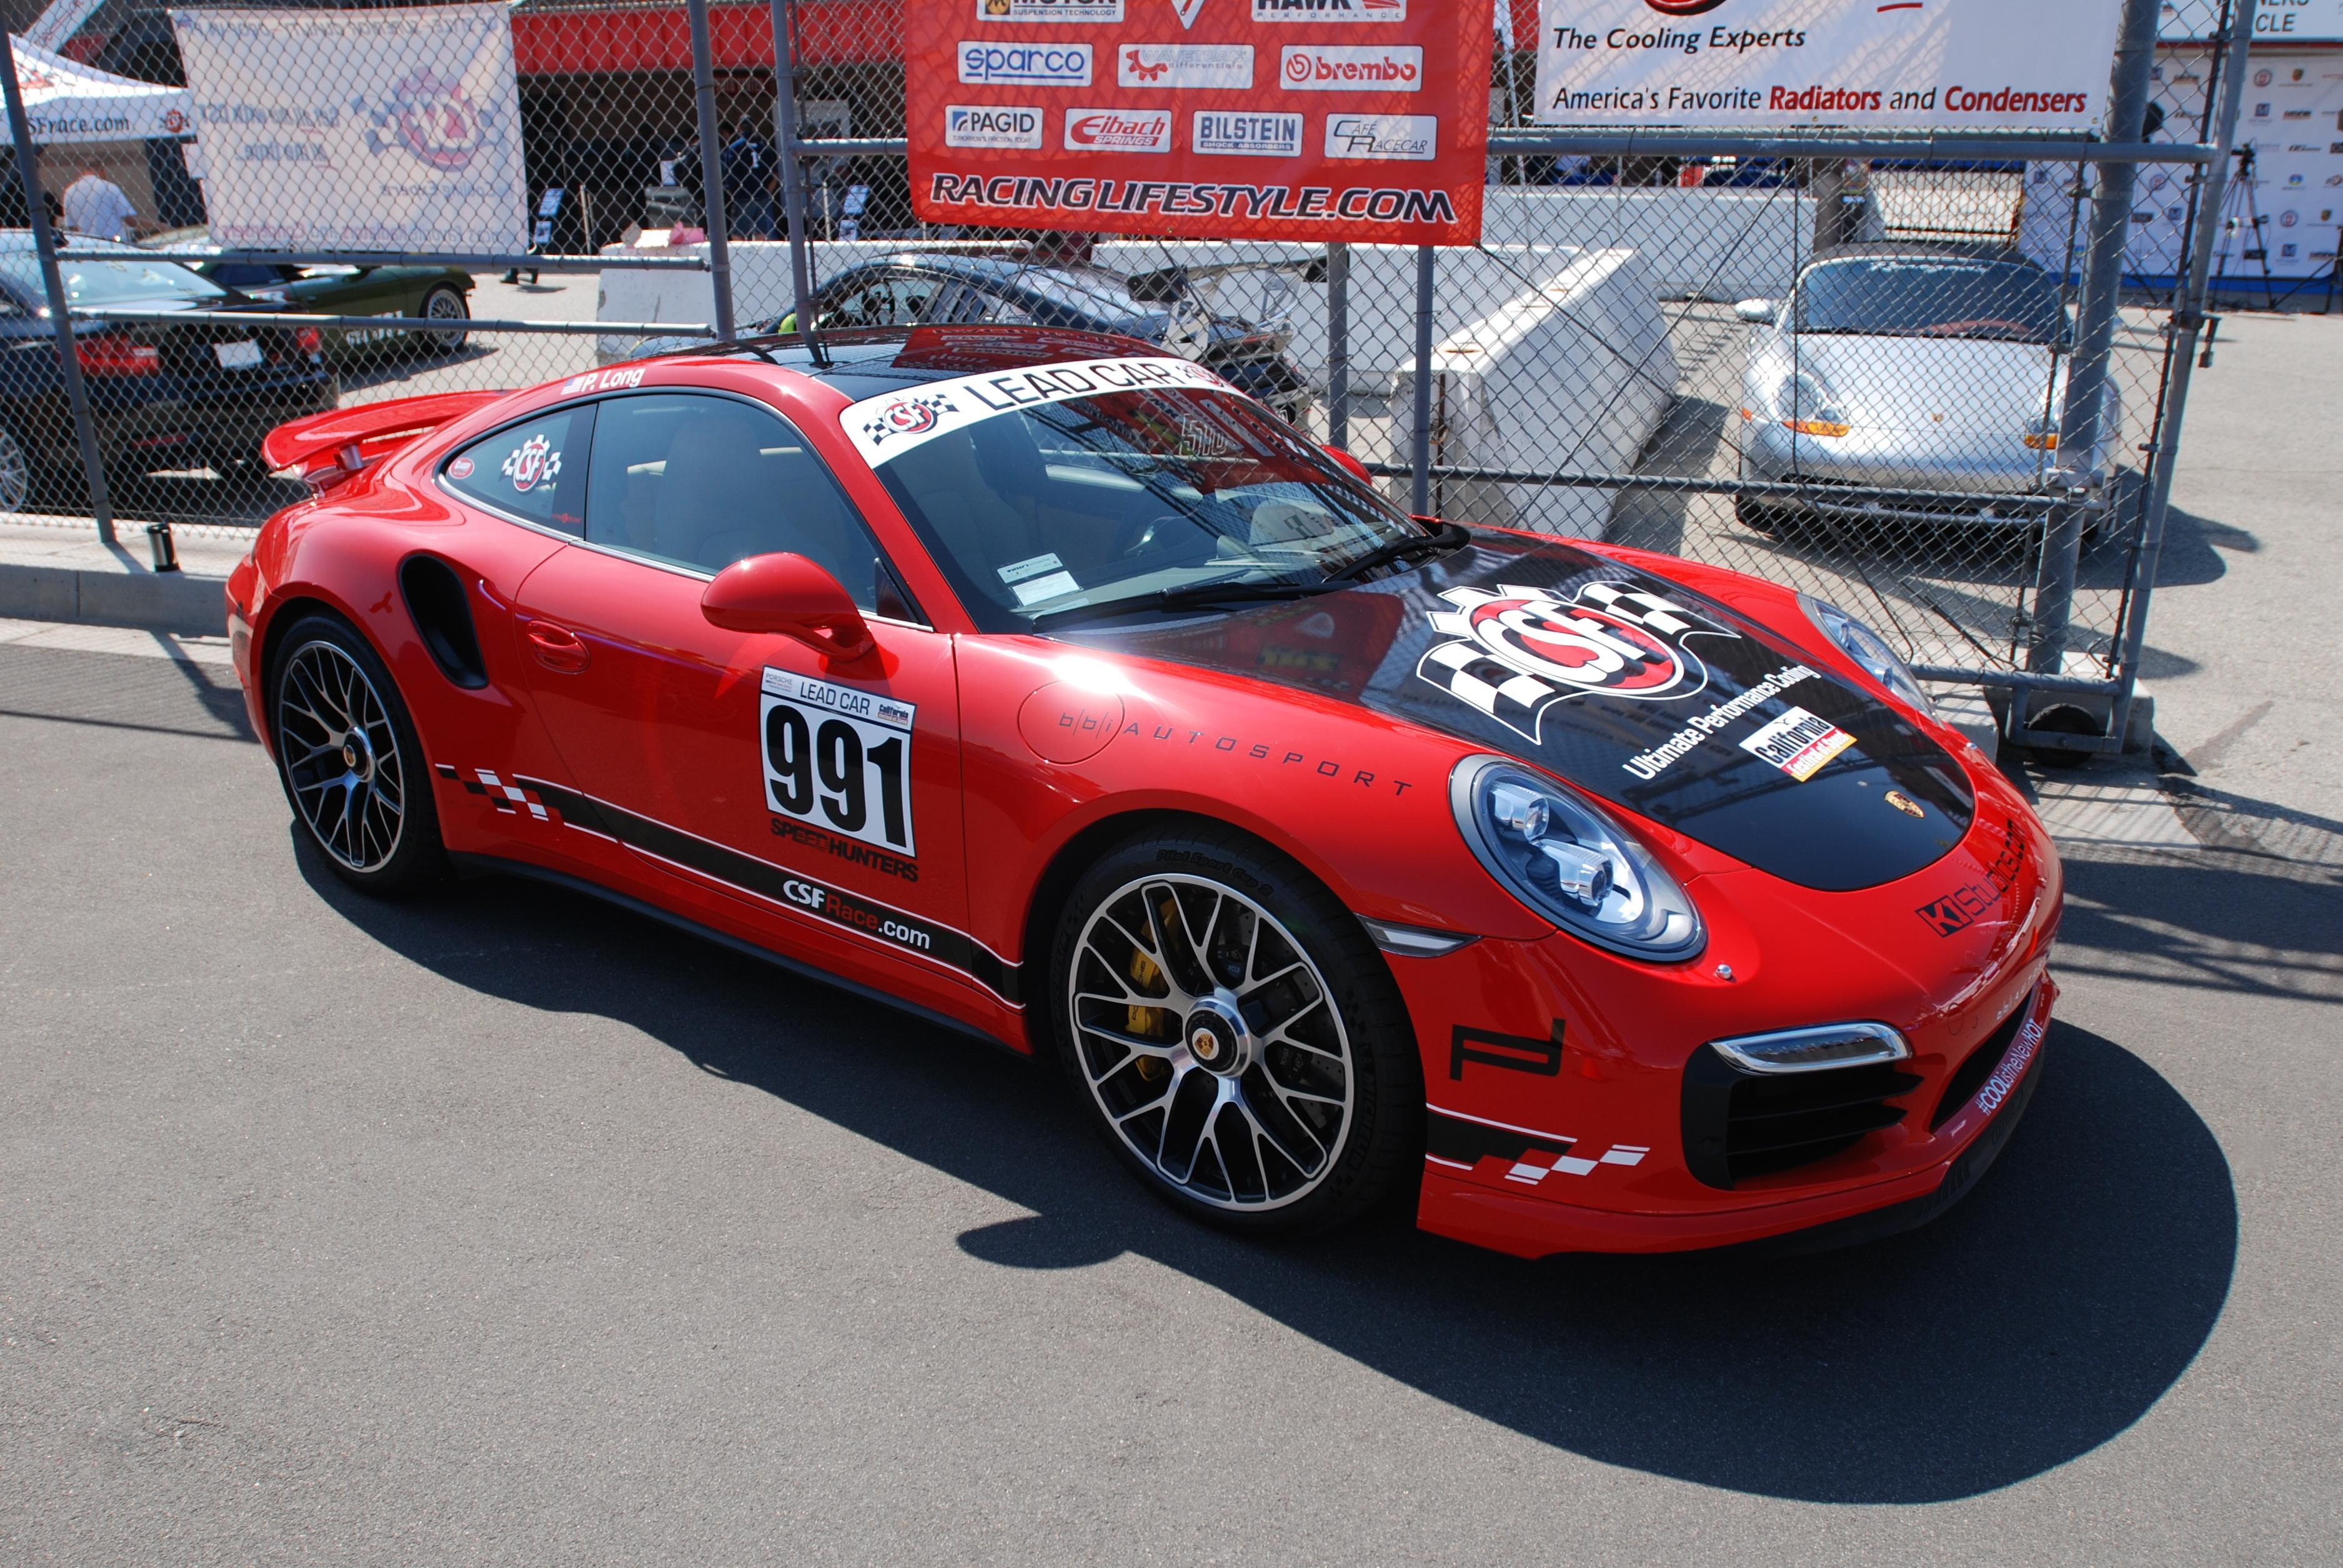 Pca Club Racing Digitaldtour - Porsche club racing